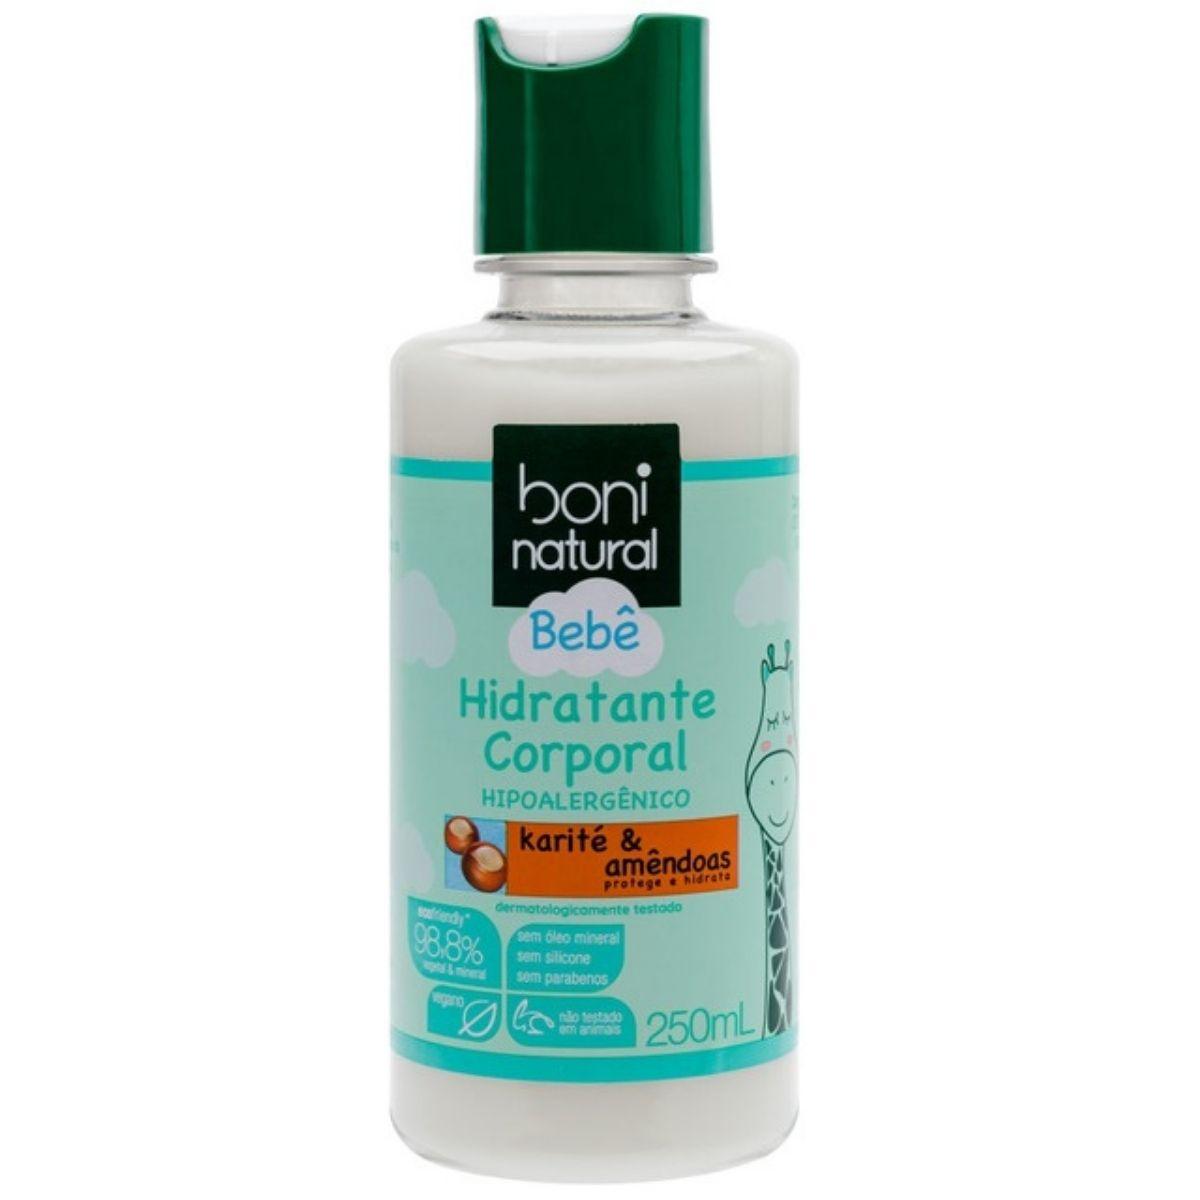 Hidratante Corporal Bebê Boni Natural Karité & Amêndoas 250ml